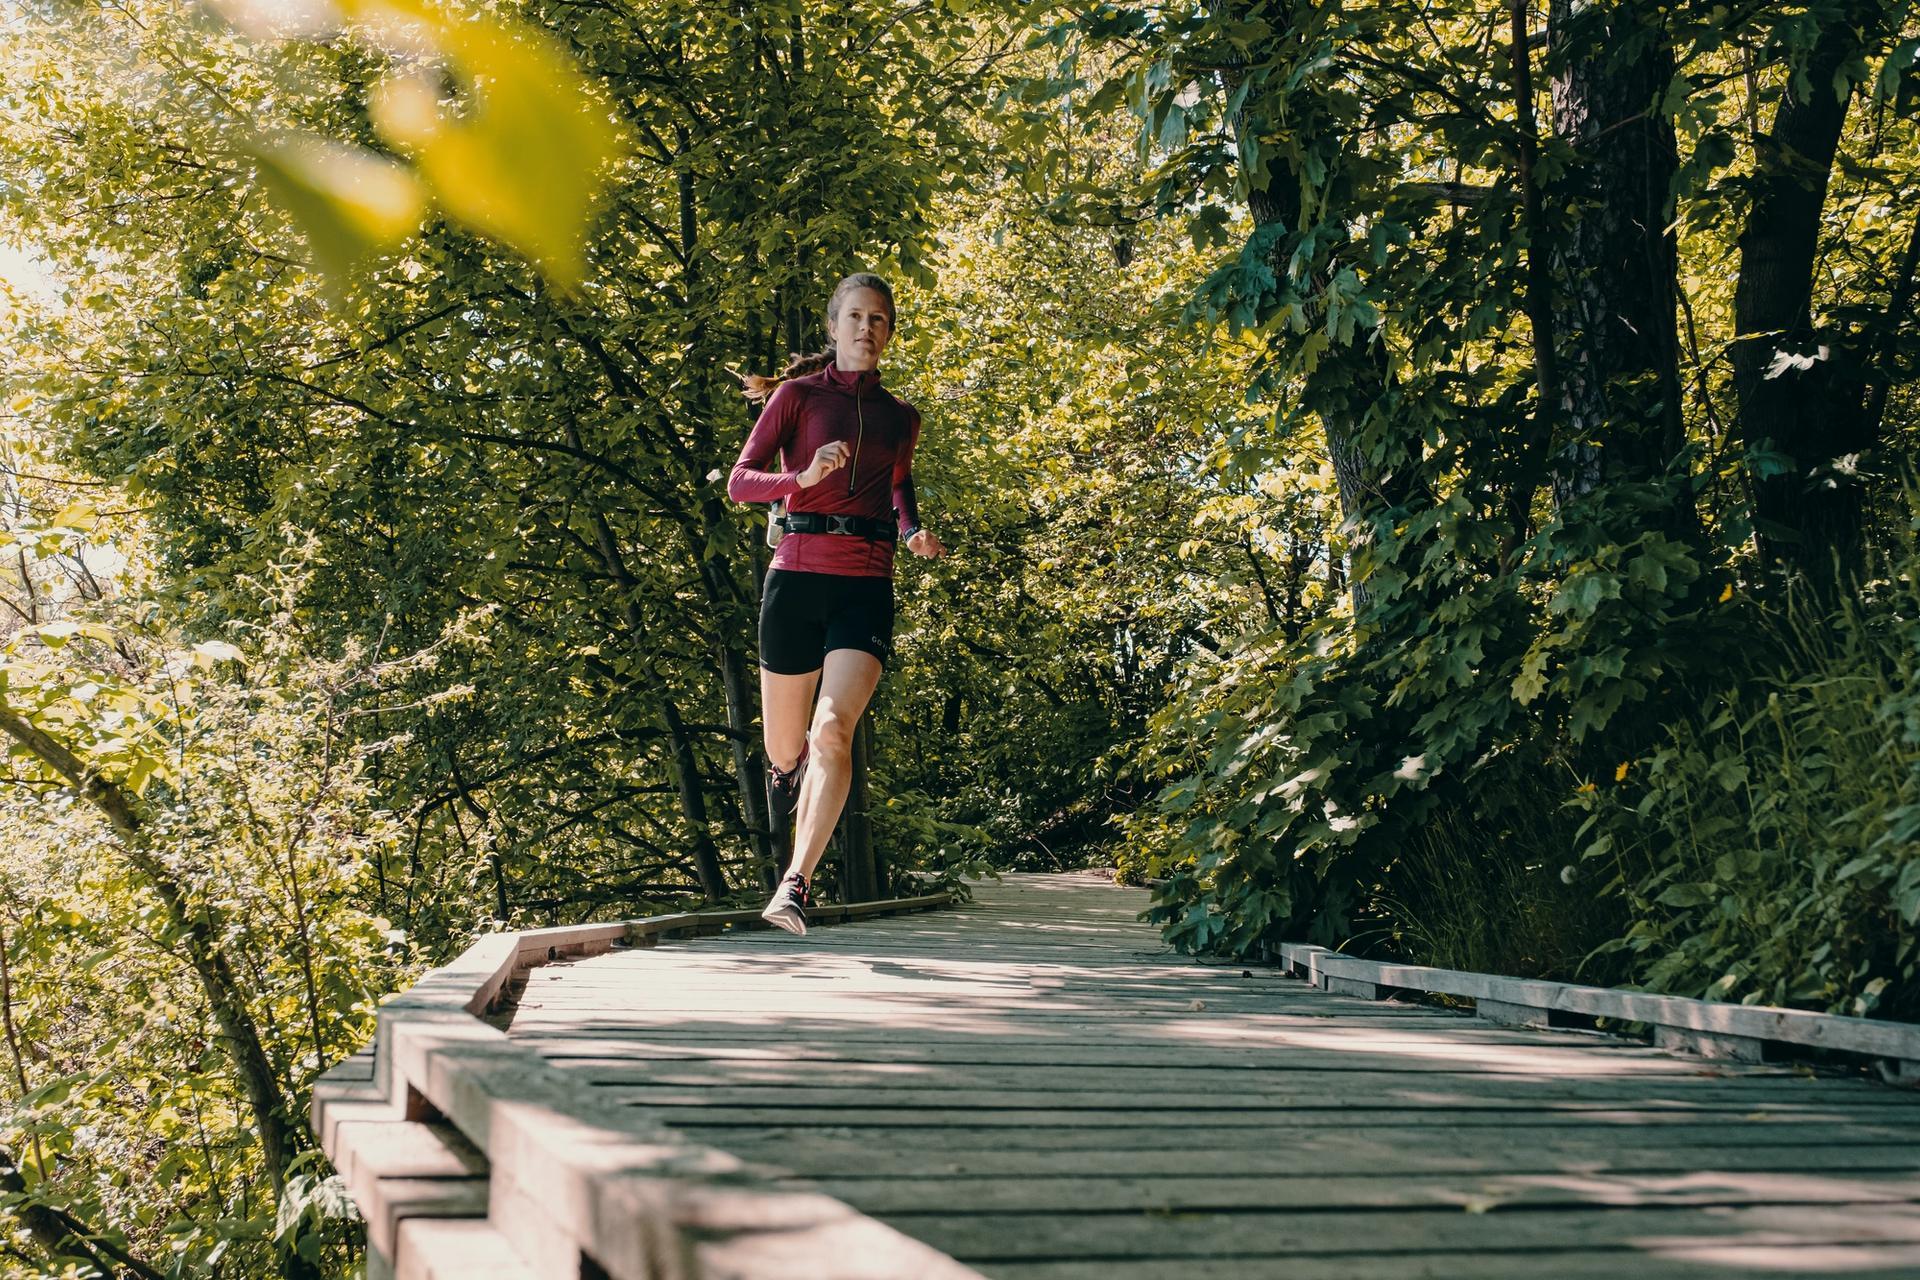 Dame løper på gangvei i park